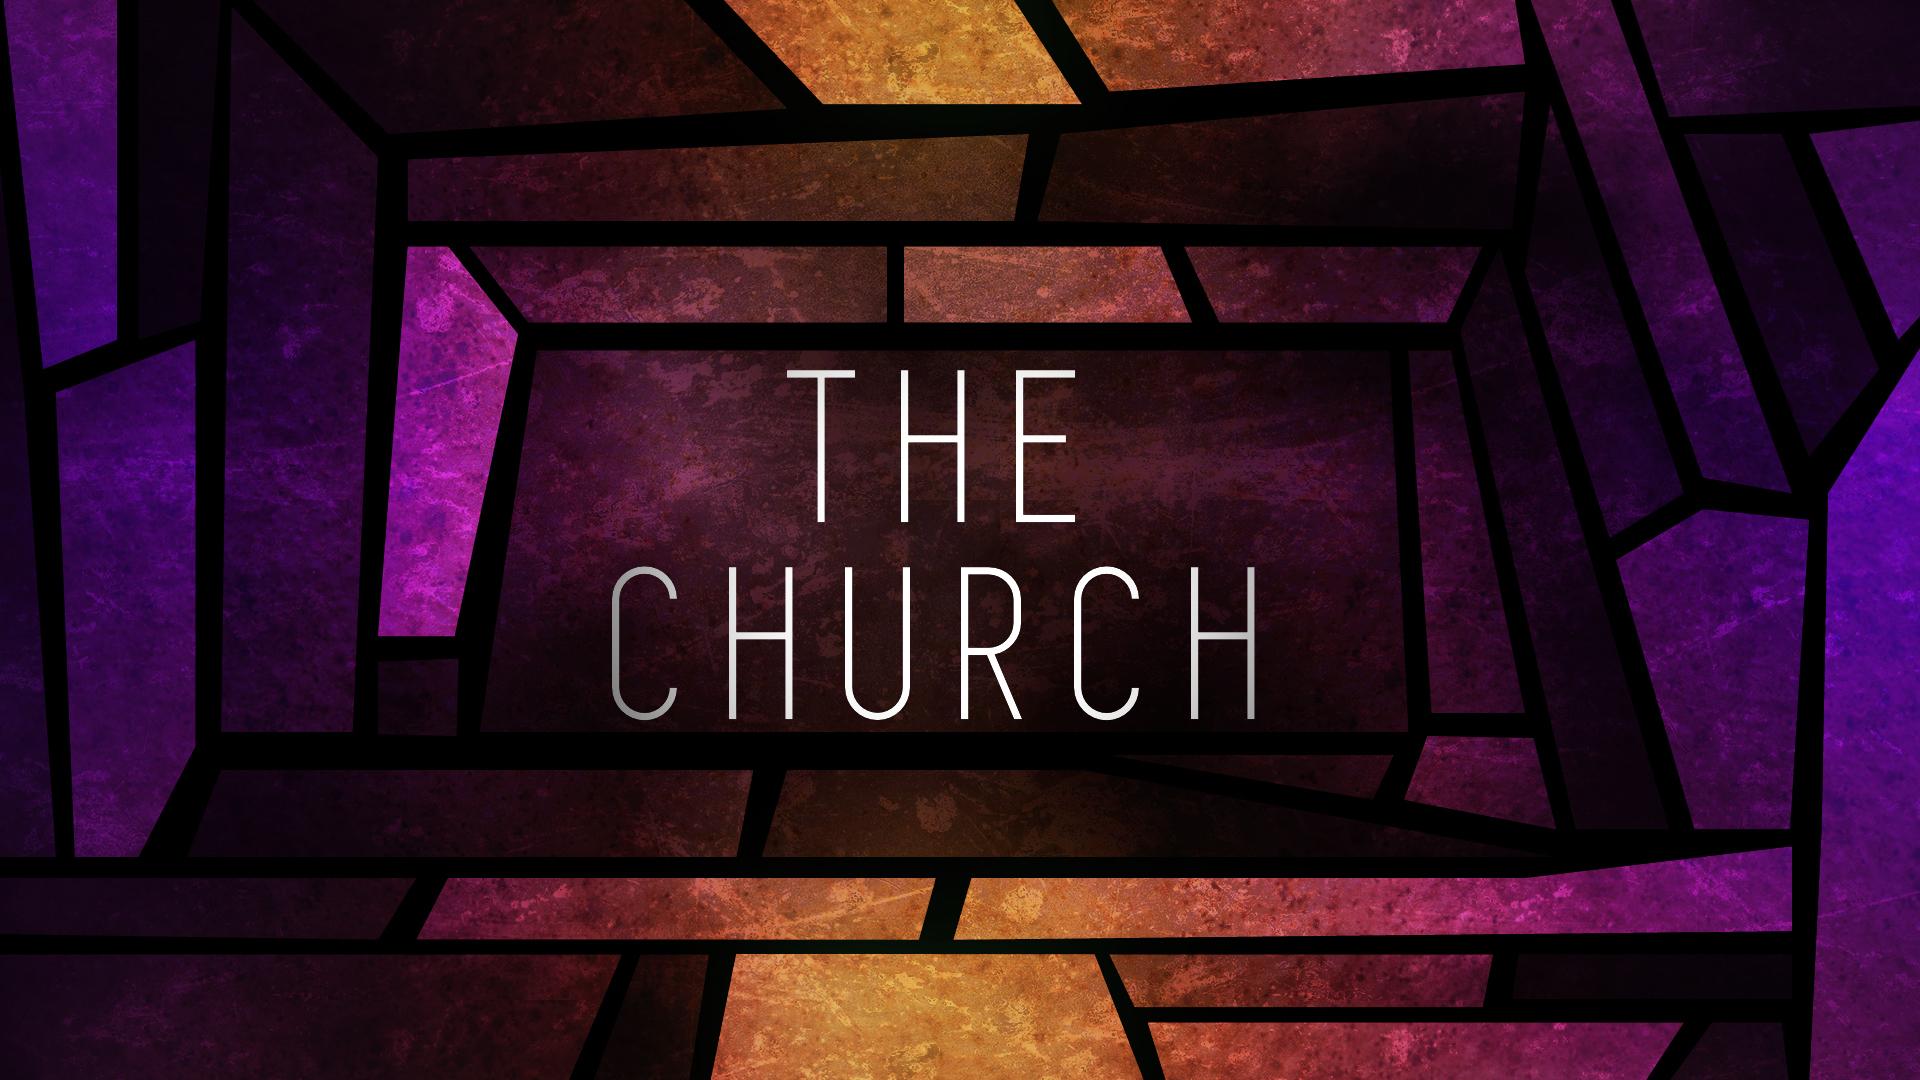 THE CHURCH Title Slide.jpg